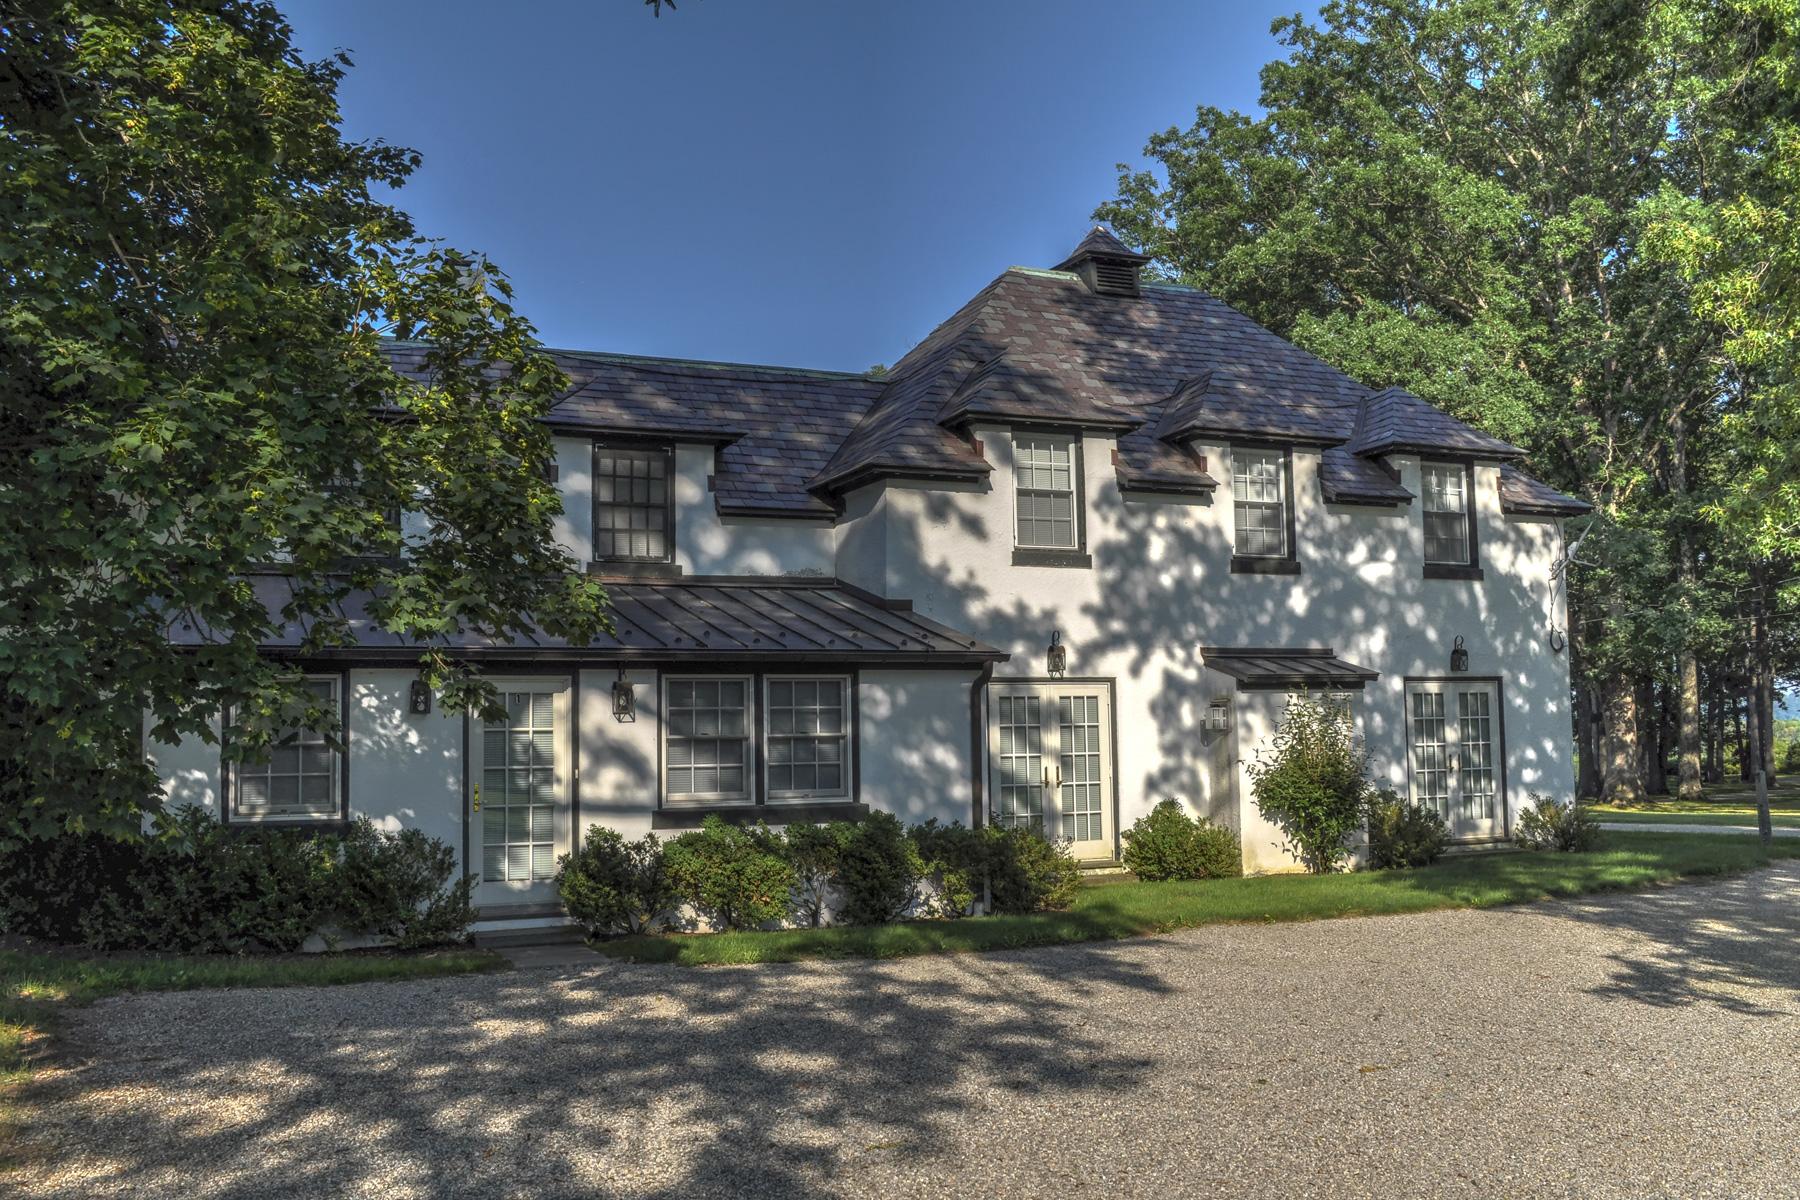 公寓 为 出租 在 Bindon Farm Cottage 1440 D Larger Cross Road N 贝德明斯特, 新泽西州 07921 美国